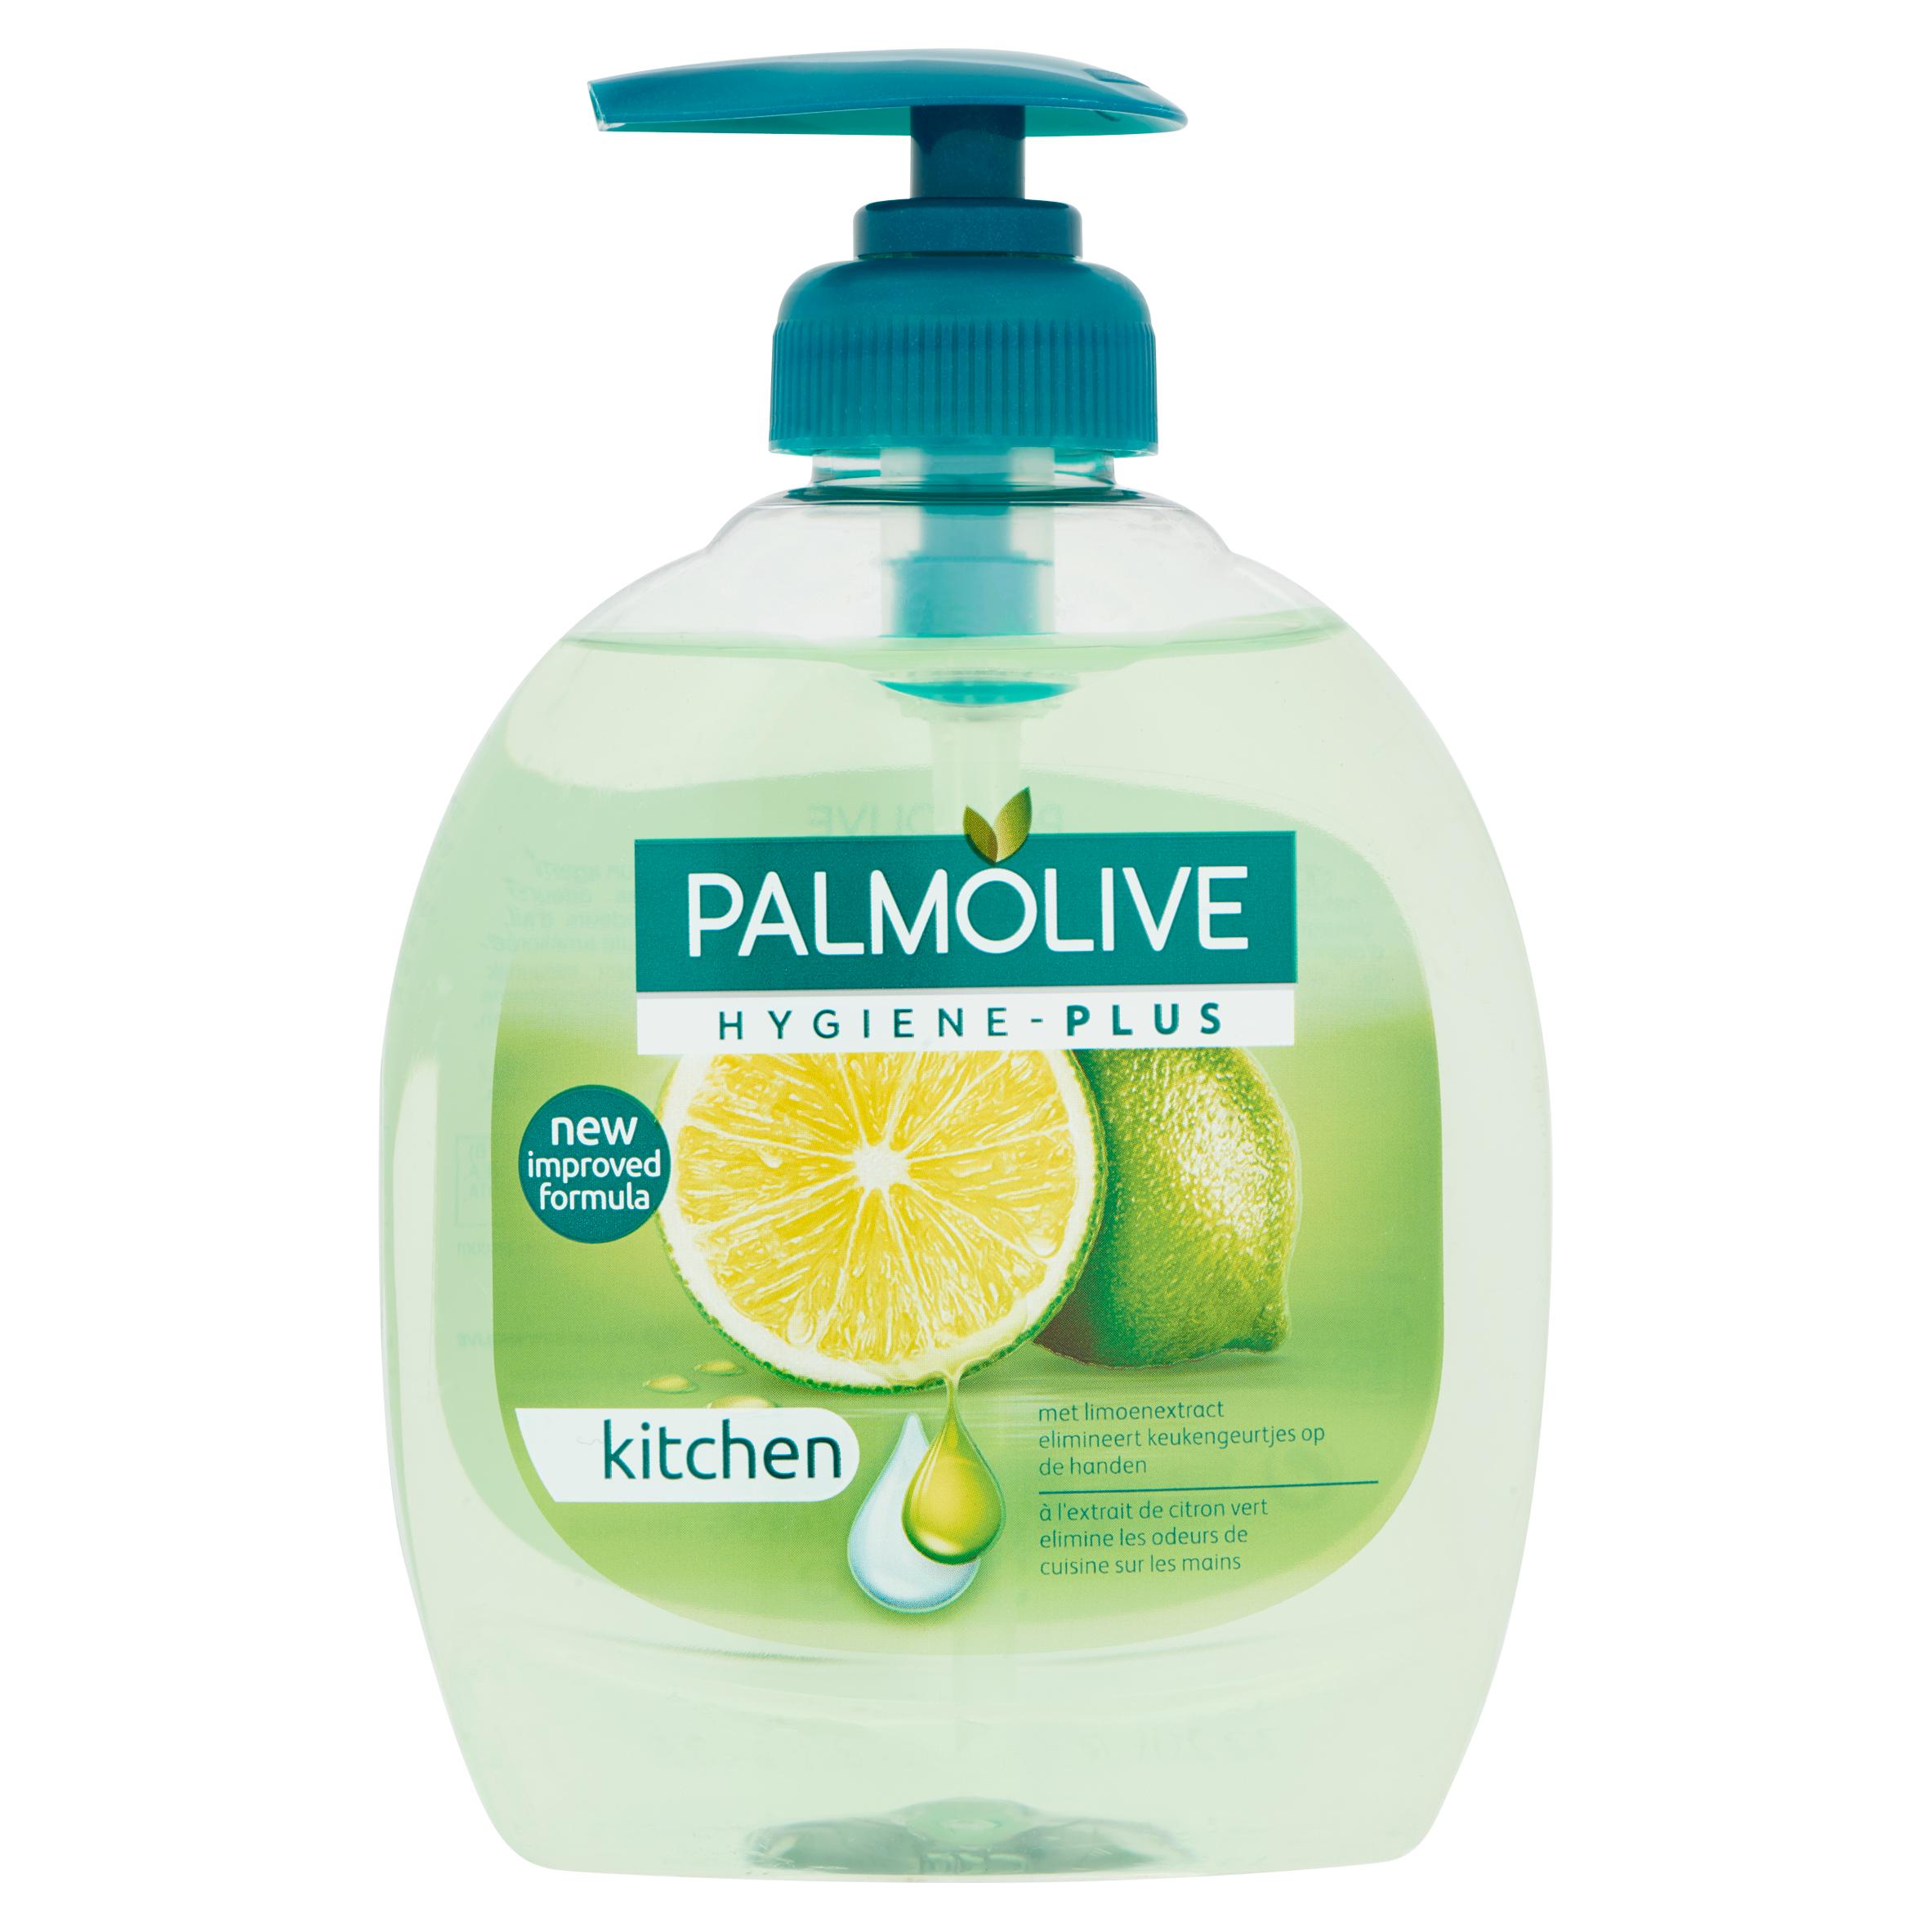 Palmolive Hygiene Plus Keuken Handzeep 300ml